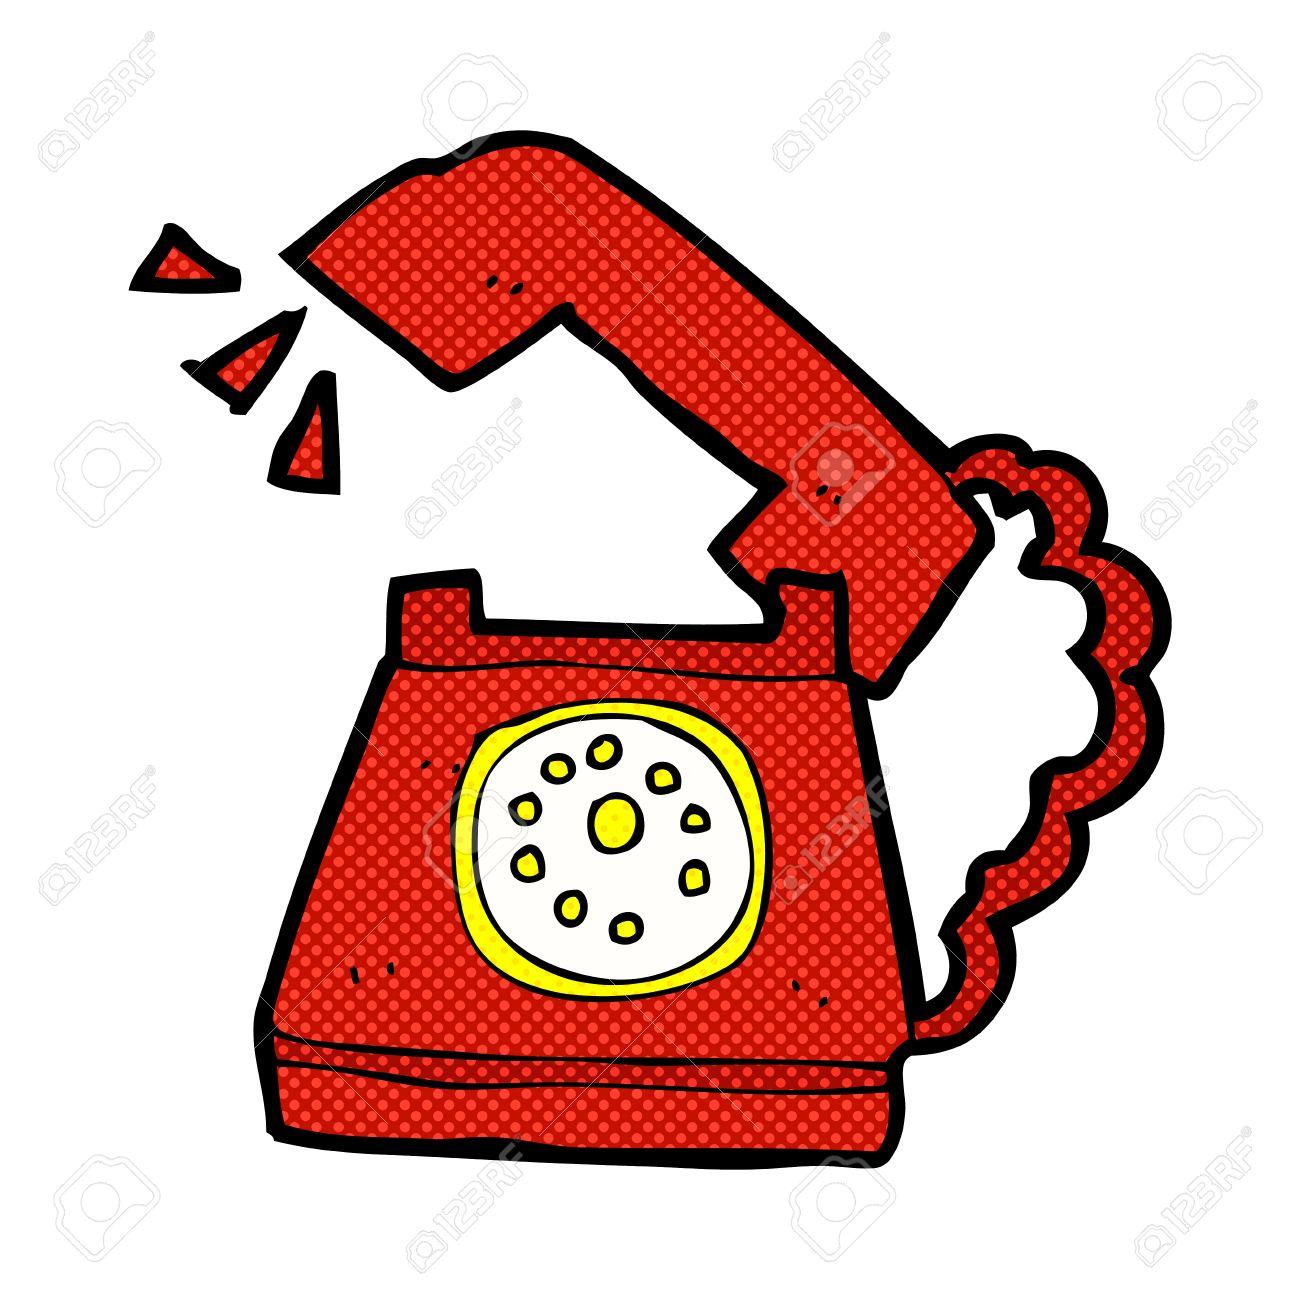 Stuhl comic  Retro Comic Book Style Cartoon Ringing Telephone Royalty Free ...